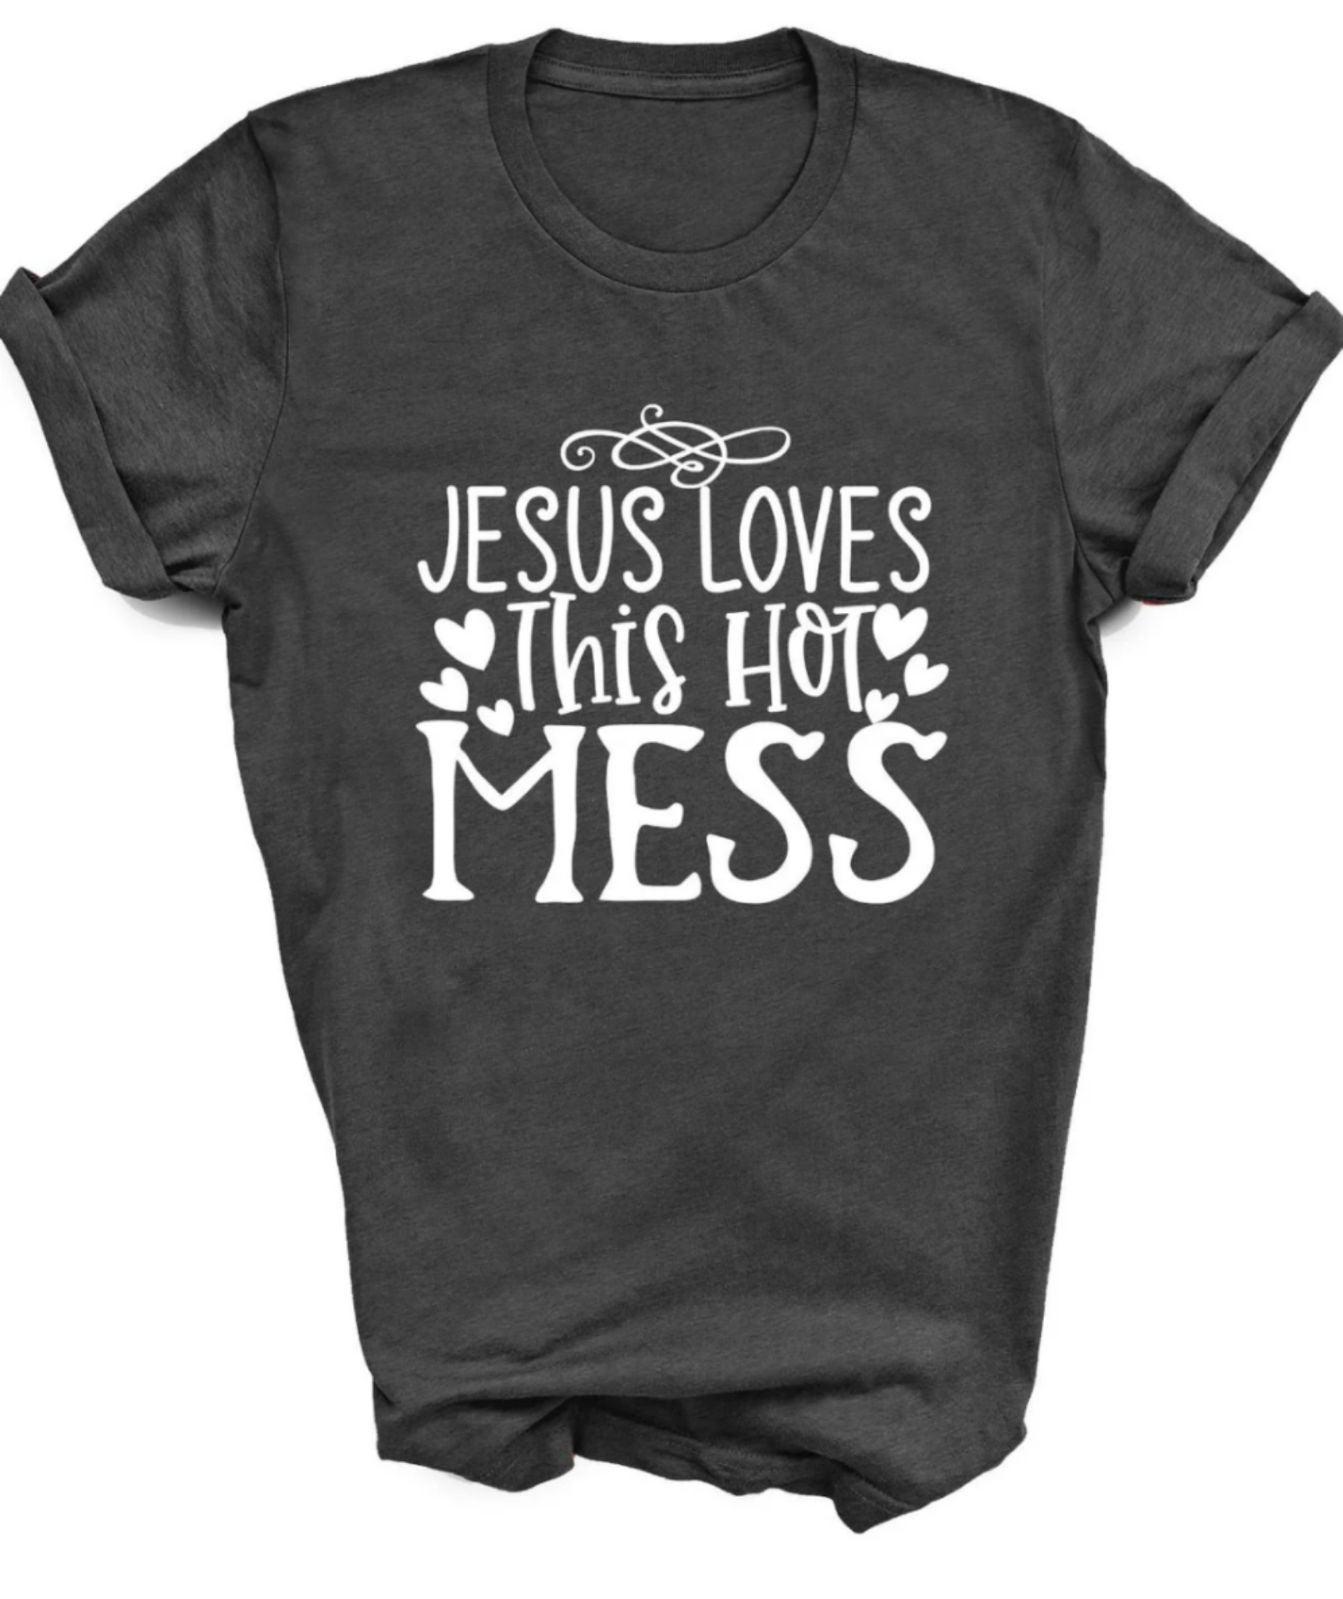 Jesus loves this hot mess gildan shirt